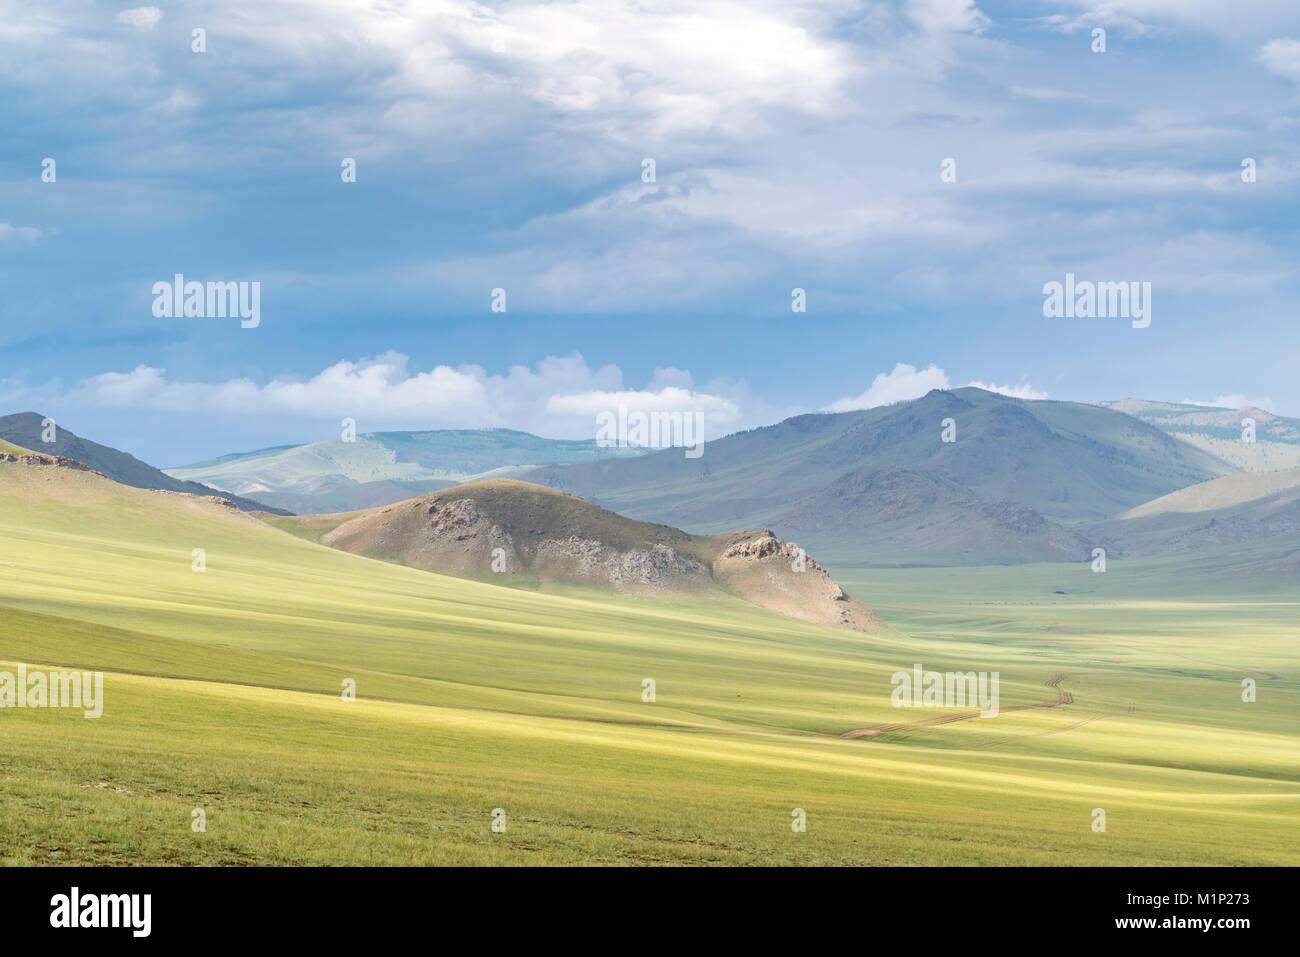 El paisaje verde de la estepa mongola bajo un cielo sombrío, provincia Ovorkhangai, Mongolia, Asia Central, Imagen De Stock